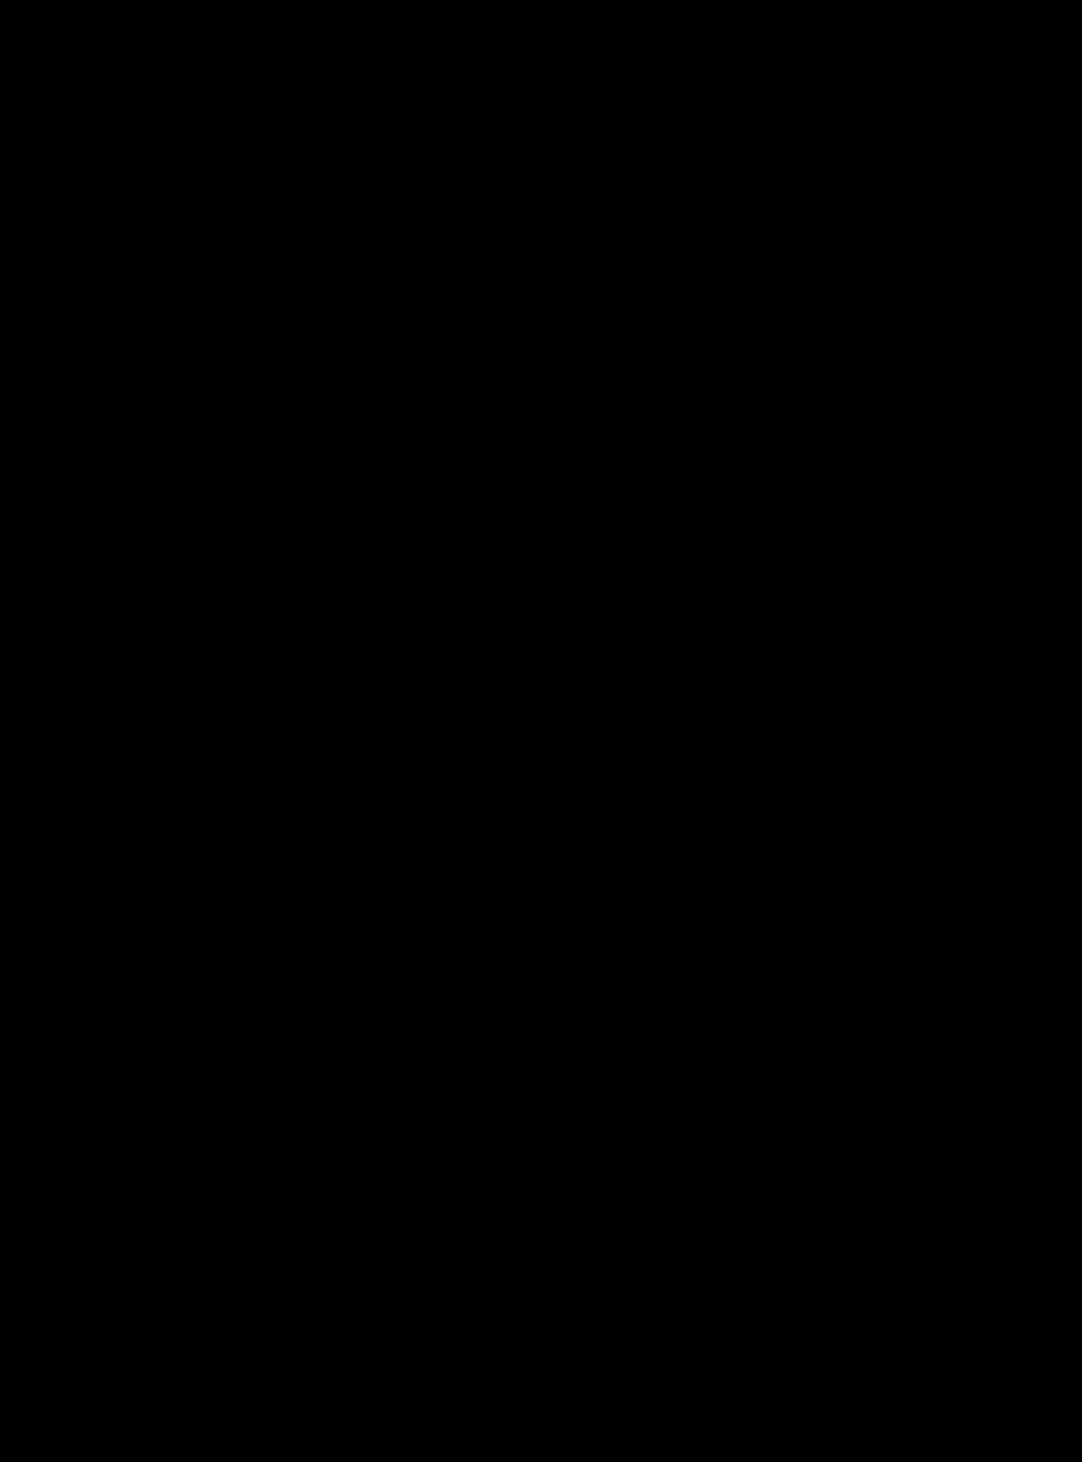 Avion Hublot Ouvert Icon.